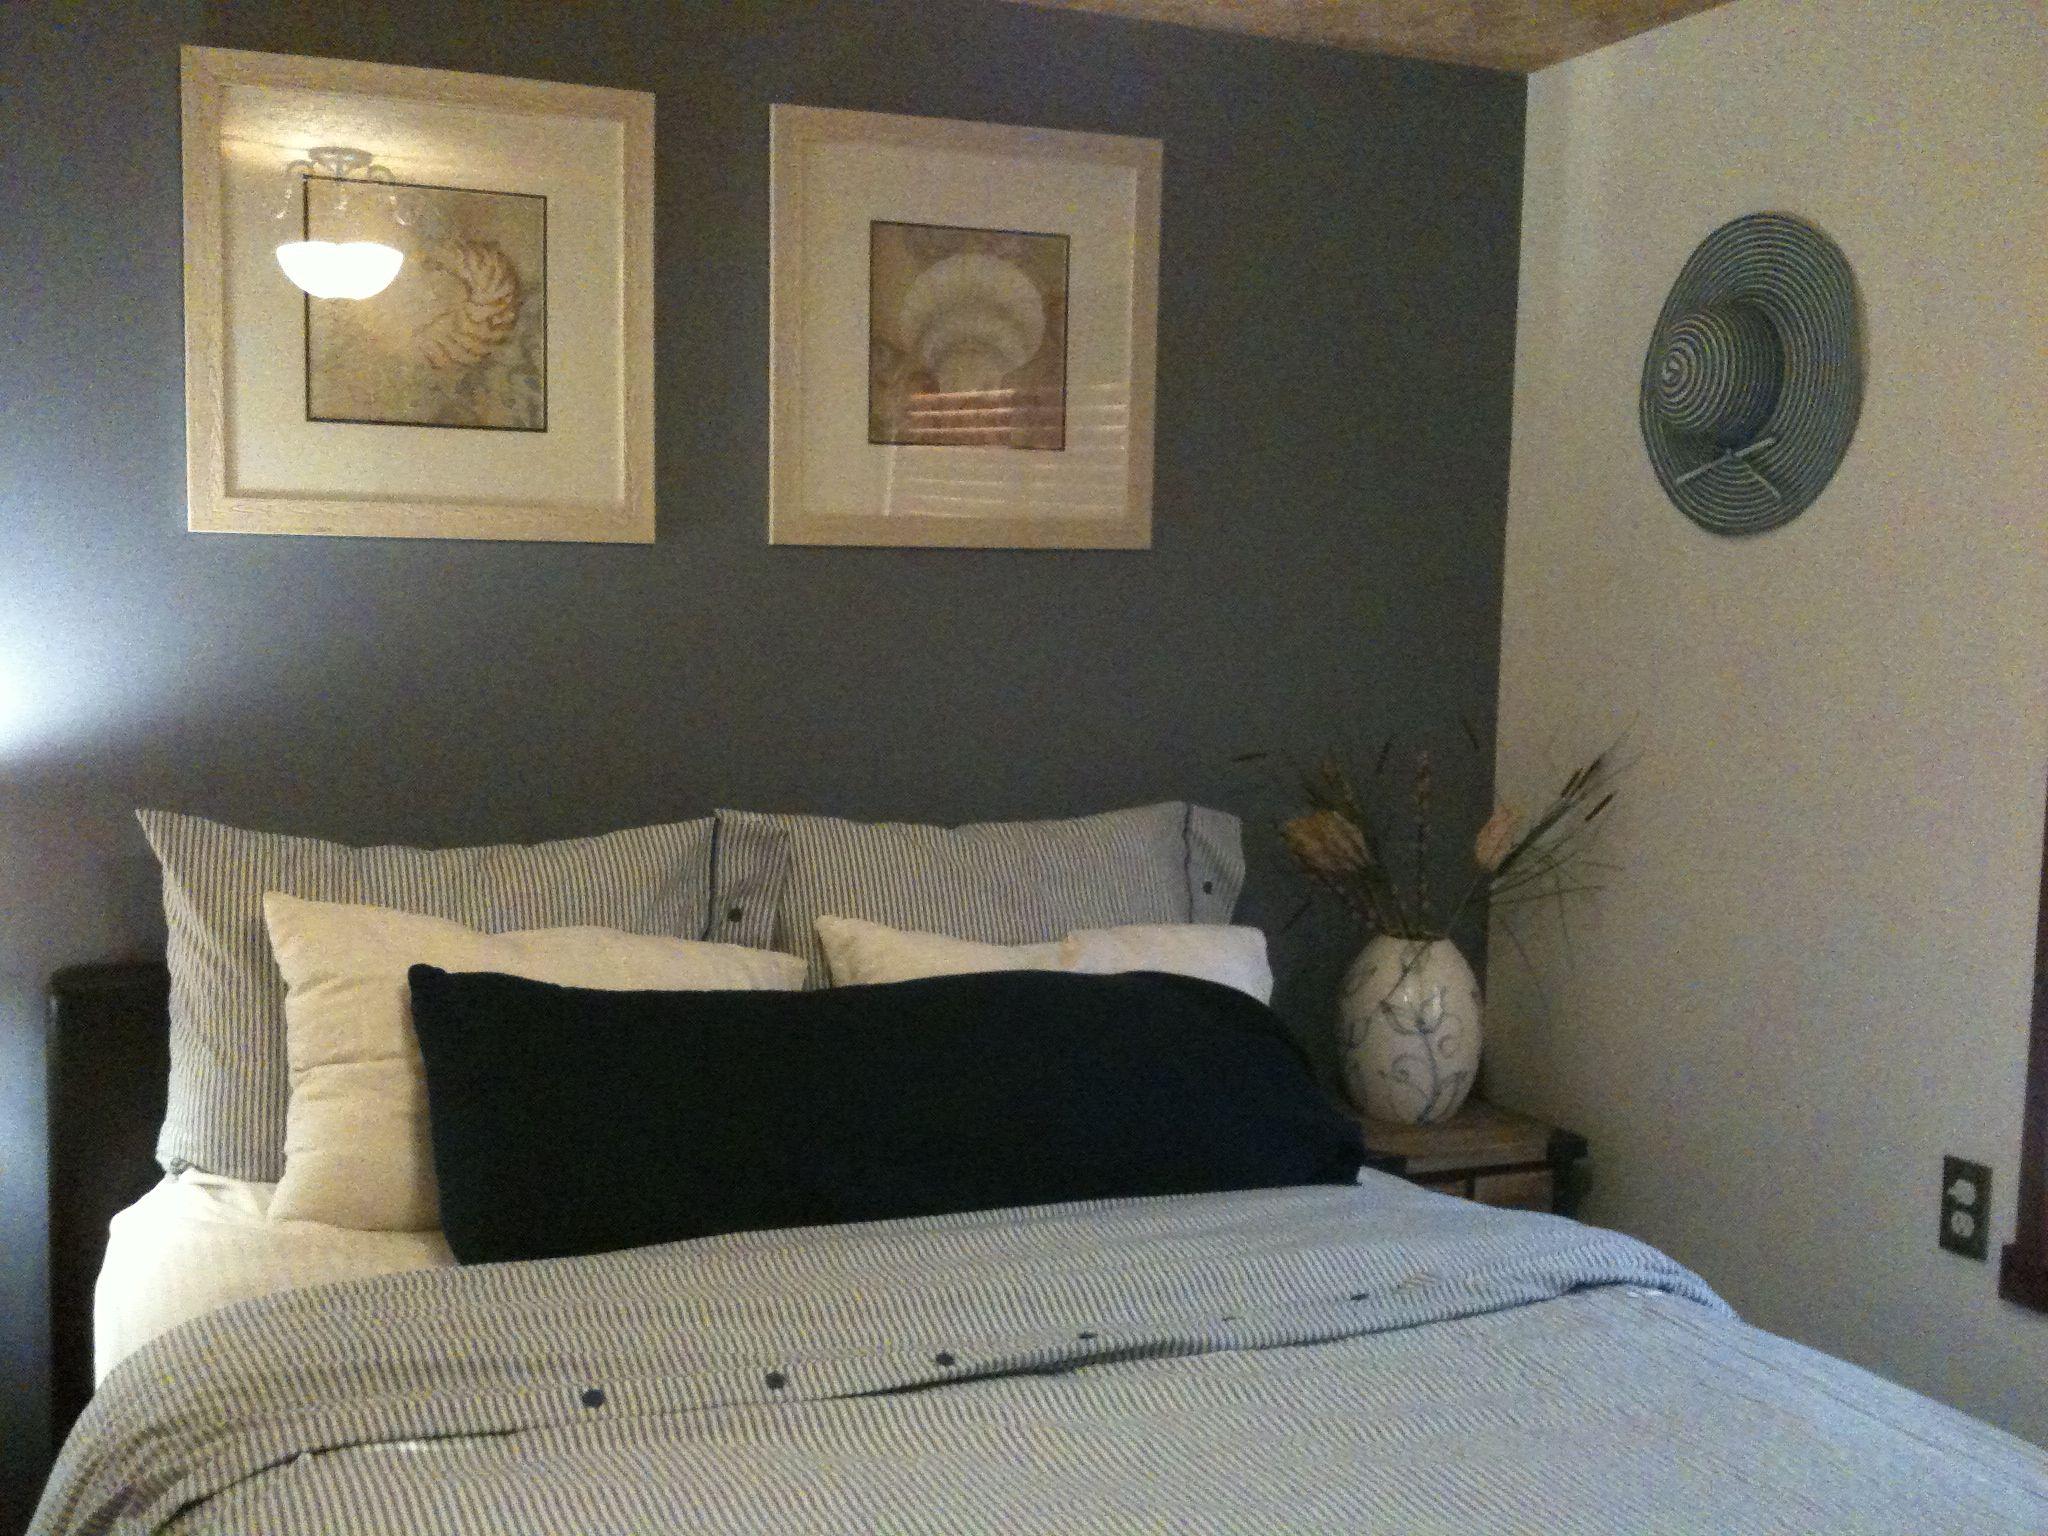 Sherwin williams bracing blue. Calming Family room paint